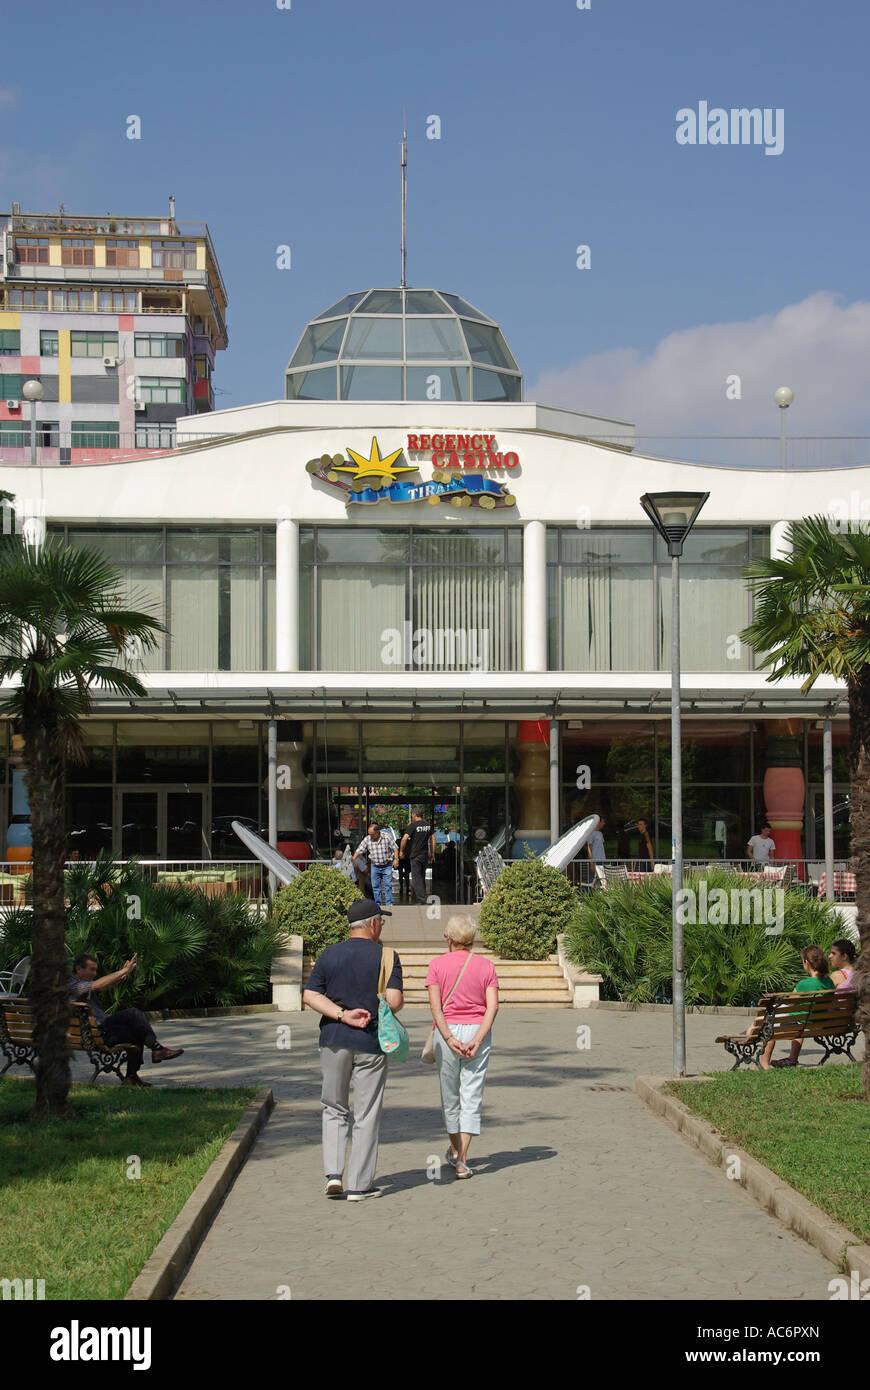 Regency casino albania casino estoril portugal